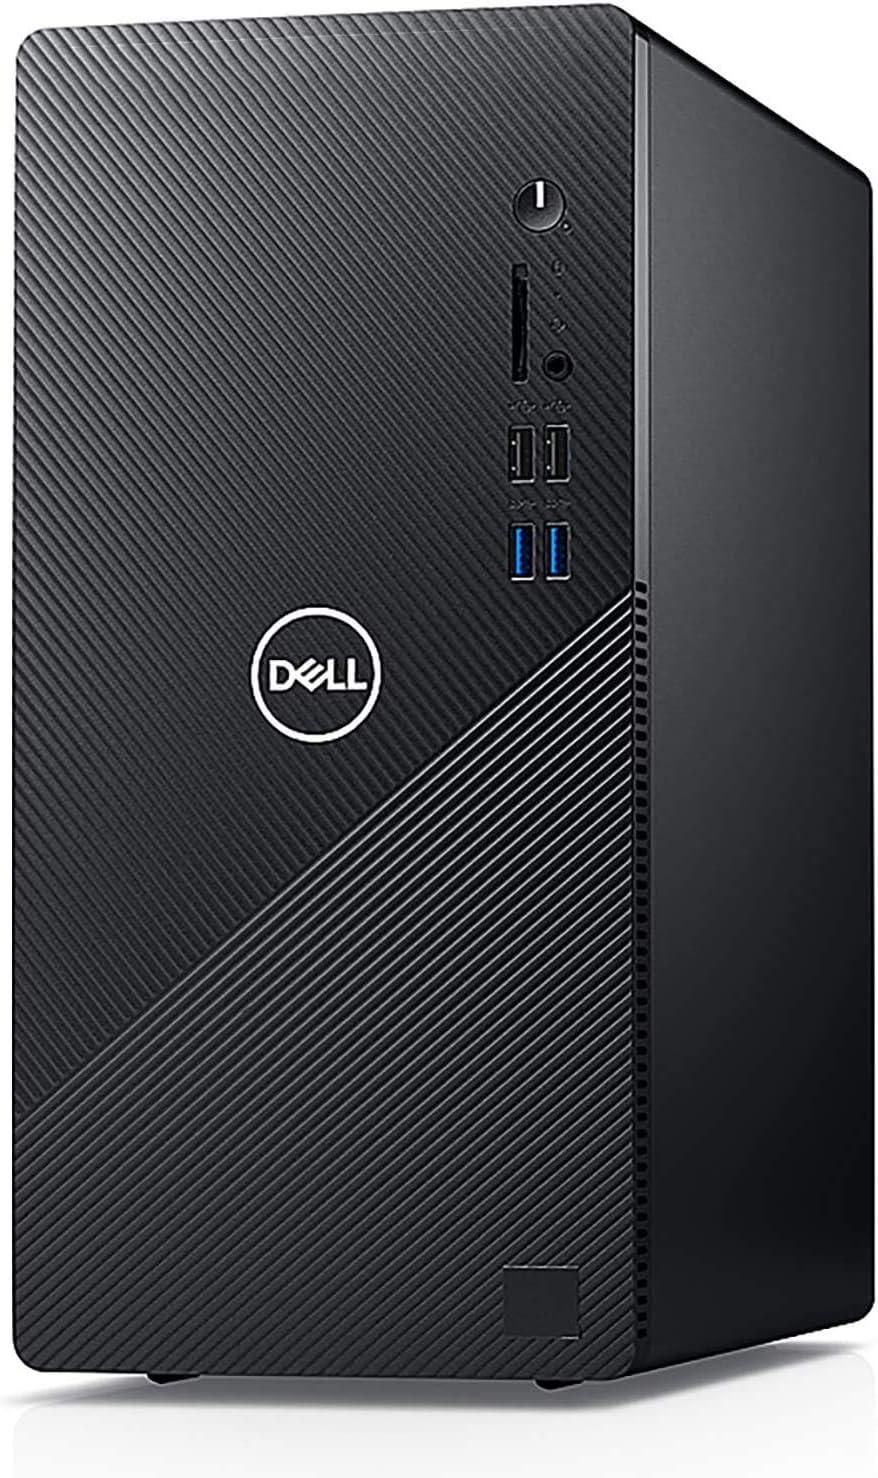 Dell Inspiron 3880 Business Desktop Computer_ Intel Quad-Core i3-10100 up to 4.3GHz (Beats I5-8400)_ 8GB DDR4_ 1TB 7200RPM HDD_ WiFi_ VGA_ HDMI_ Black_ Windows 10 Pro